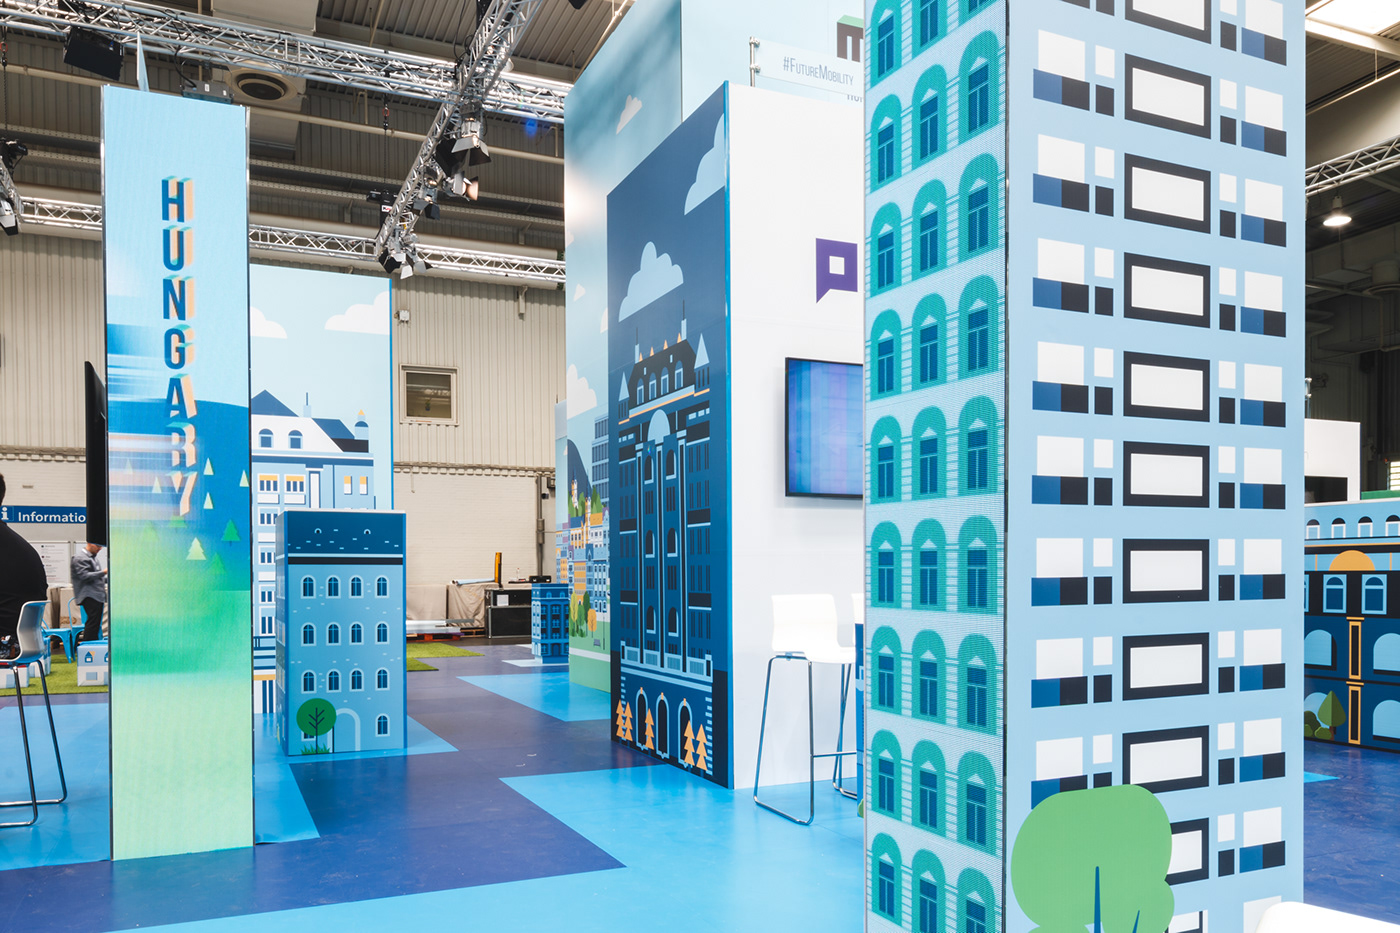 pavilion stand design Exhibition  architecture graphic design  cebit branding  flat design